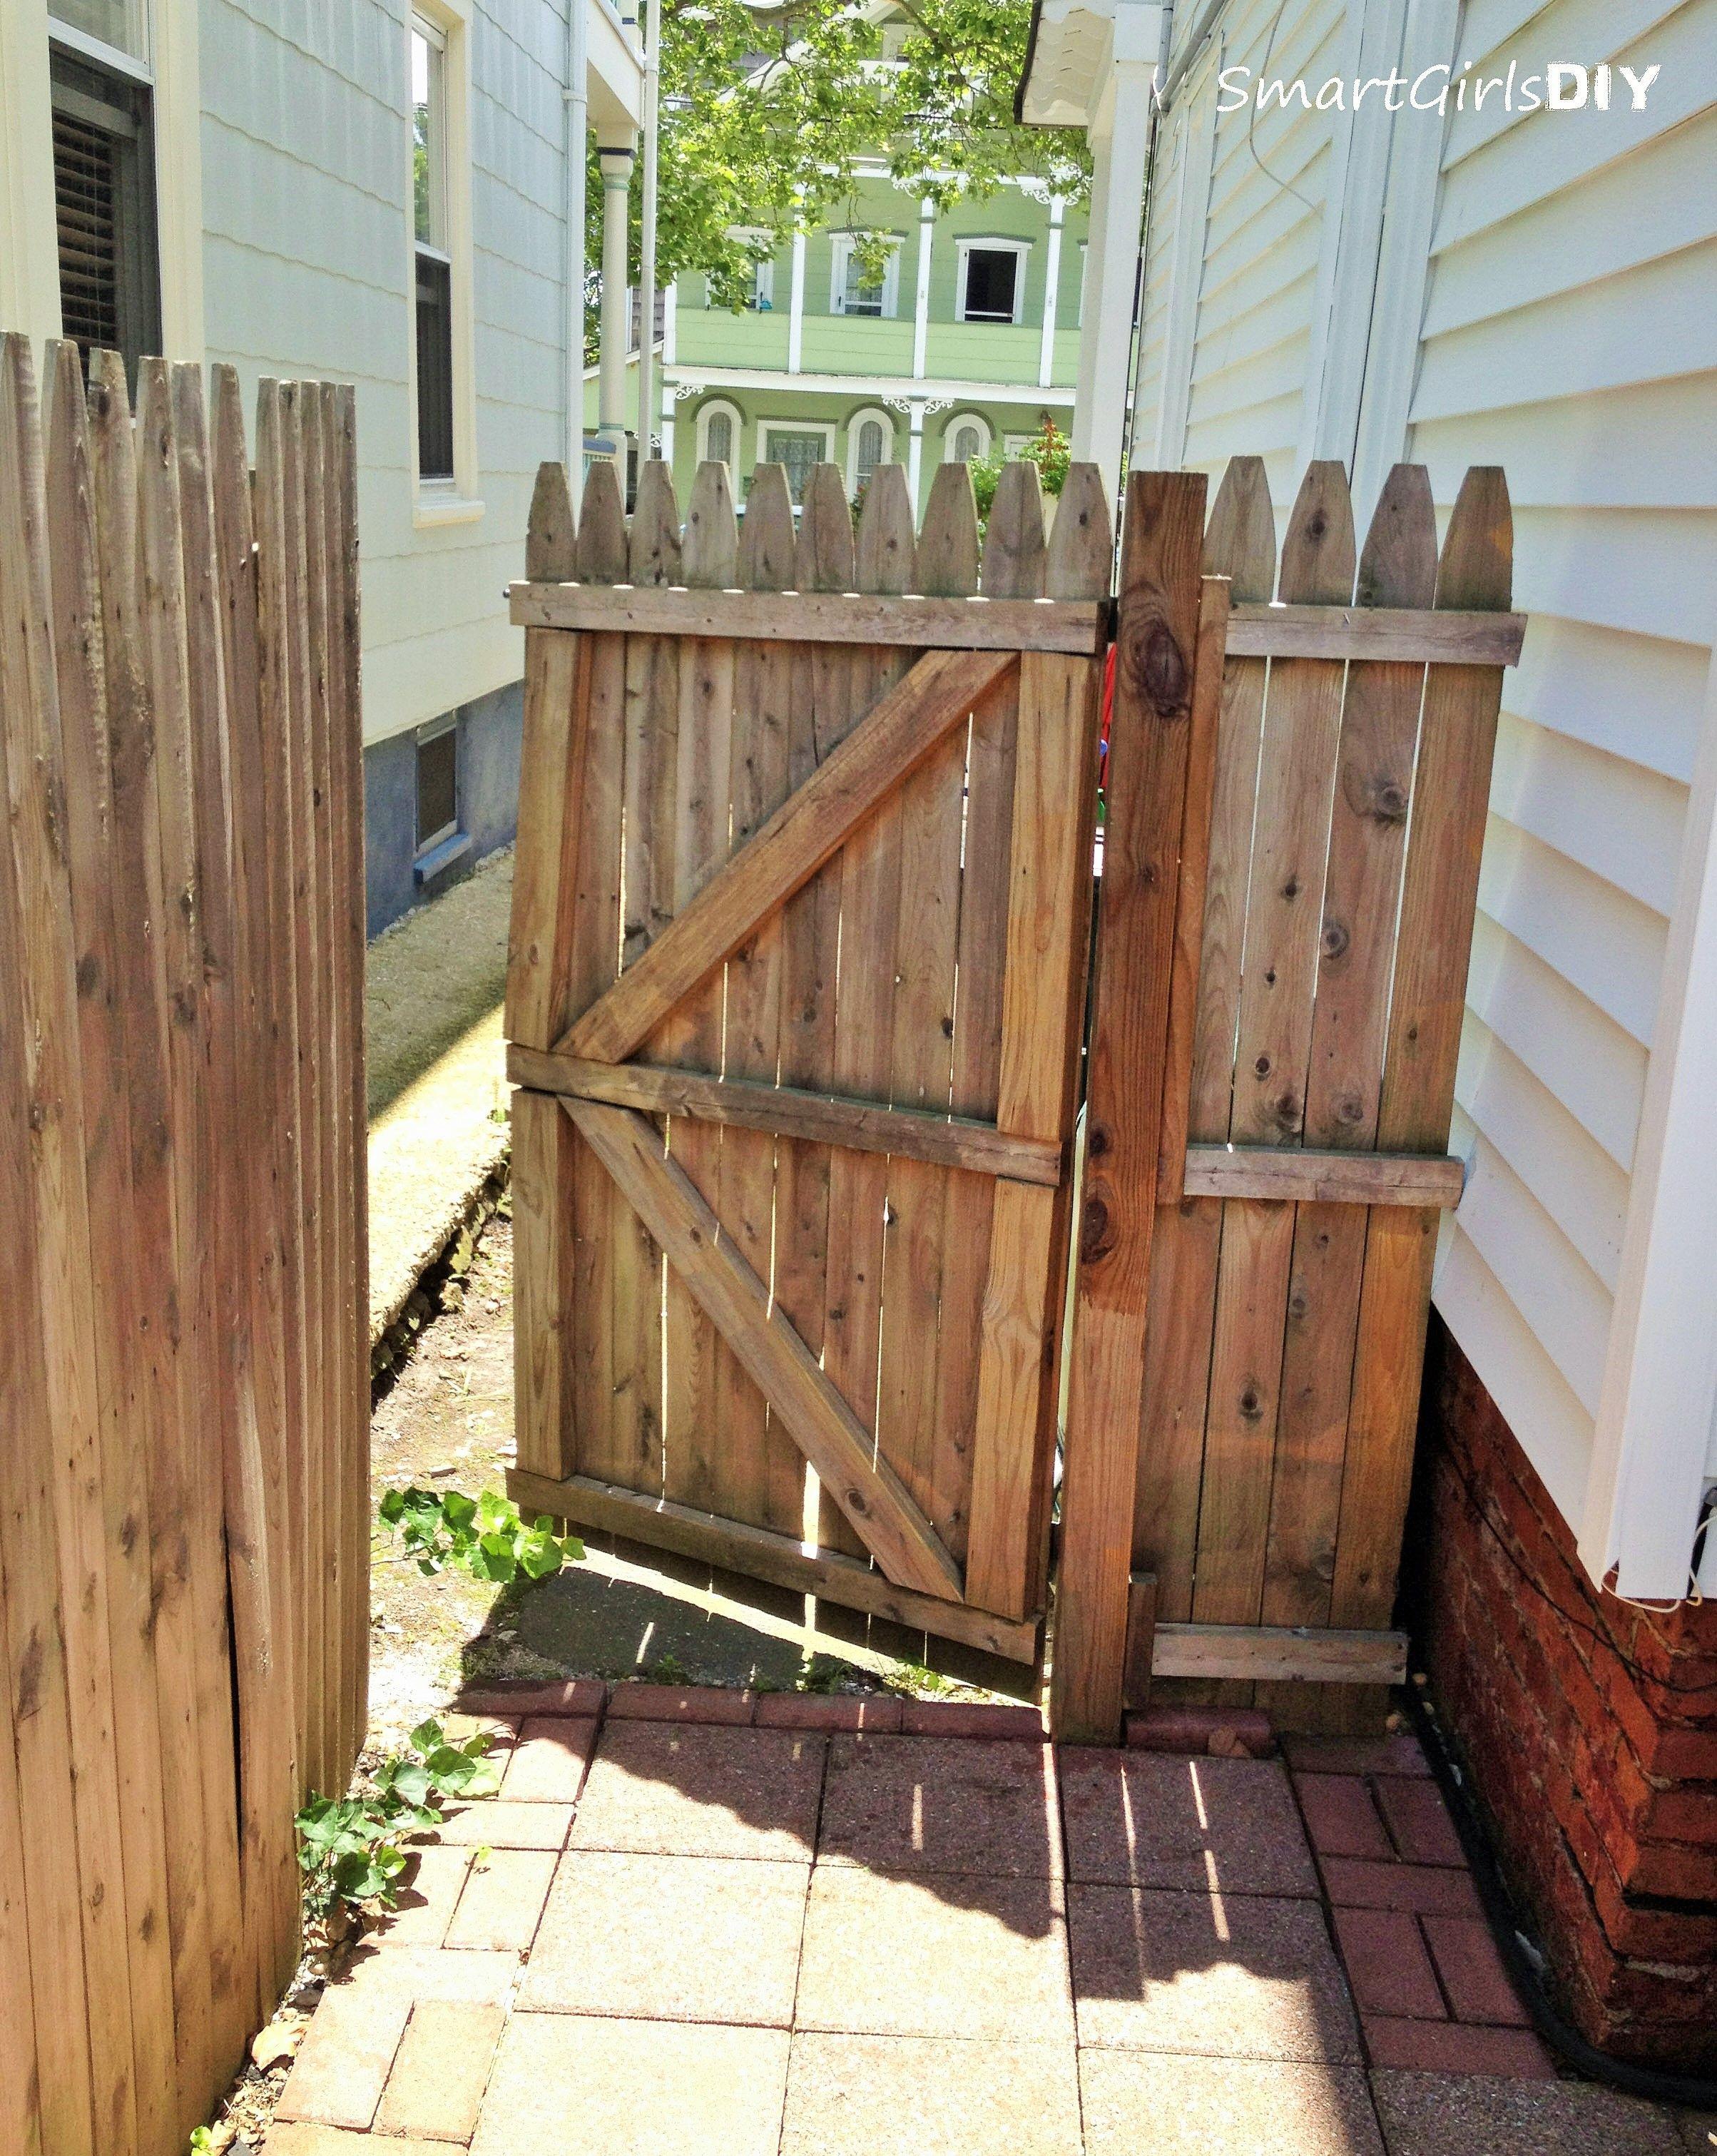 DIY Fence Building  1st gate I ever built 11 years ago Smart Girls DIY